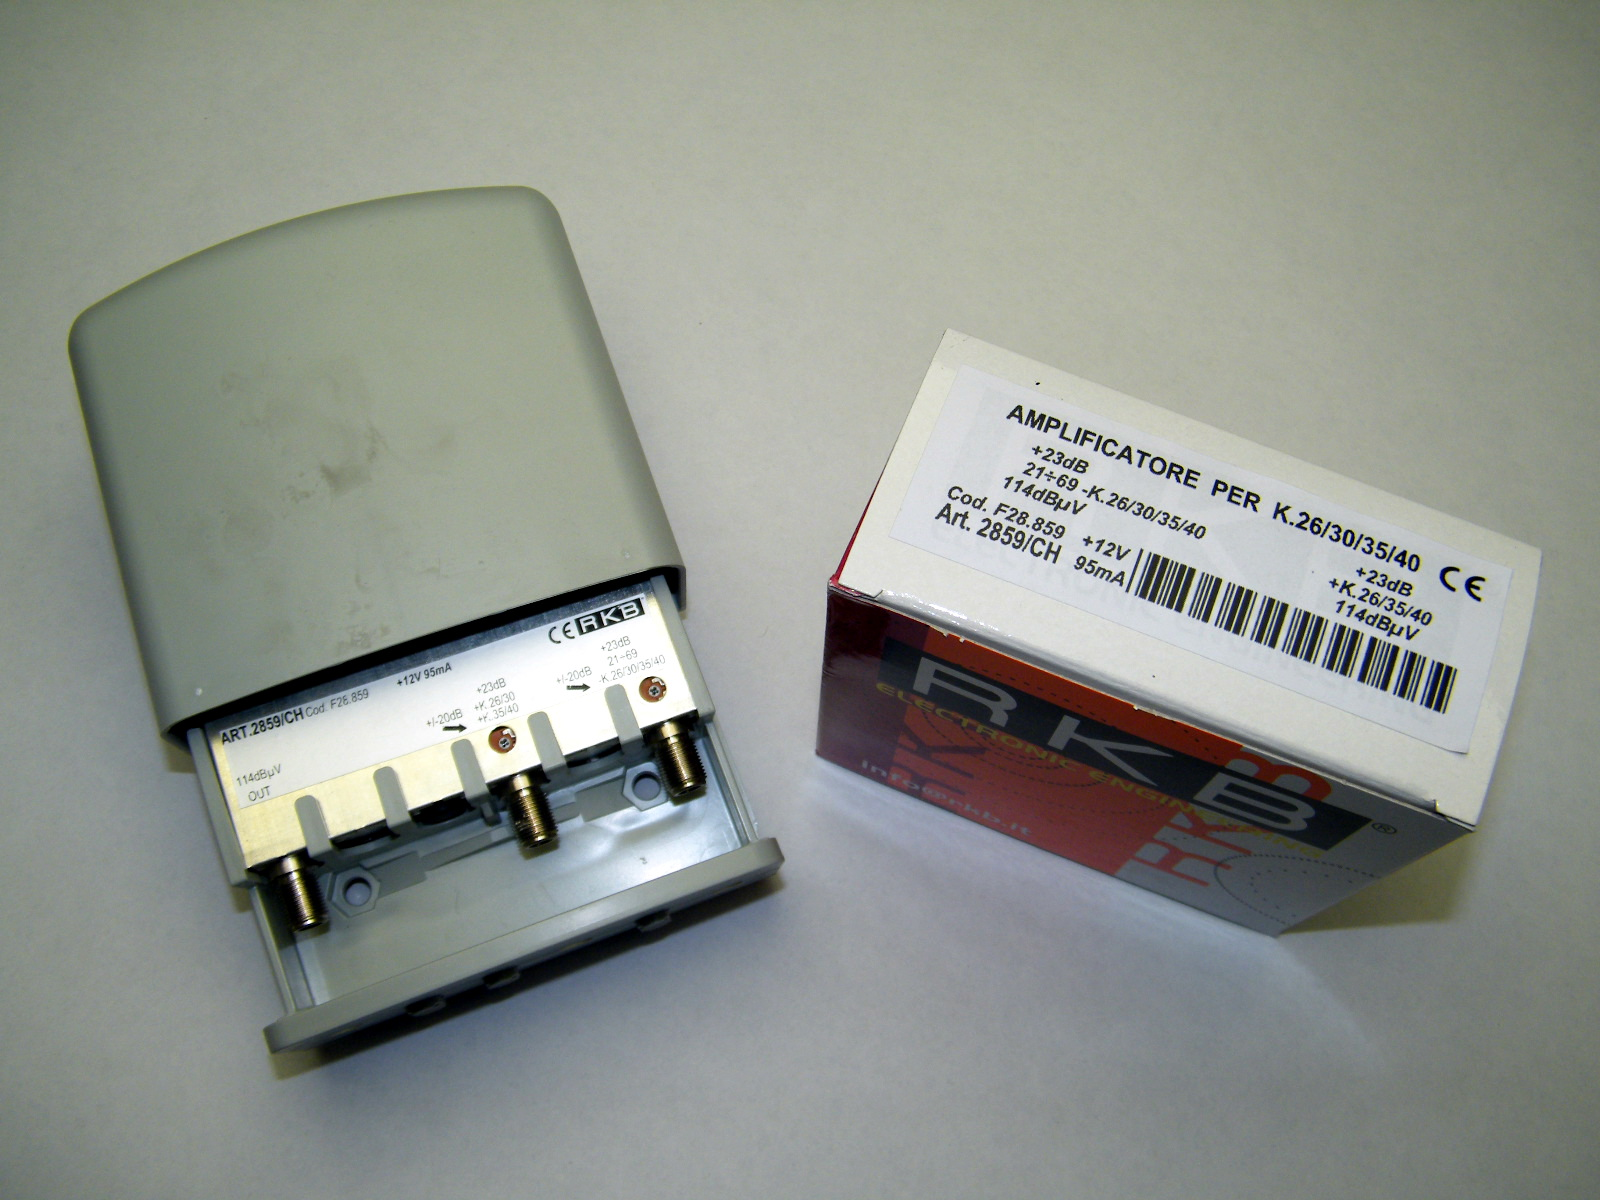 Amplificatore x 4 Mux Rai 26,30,35,40 23dB UHF-K/K 114dBuV 95mA 2859CH